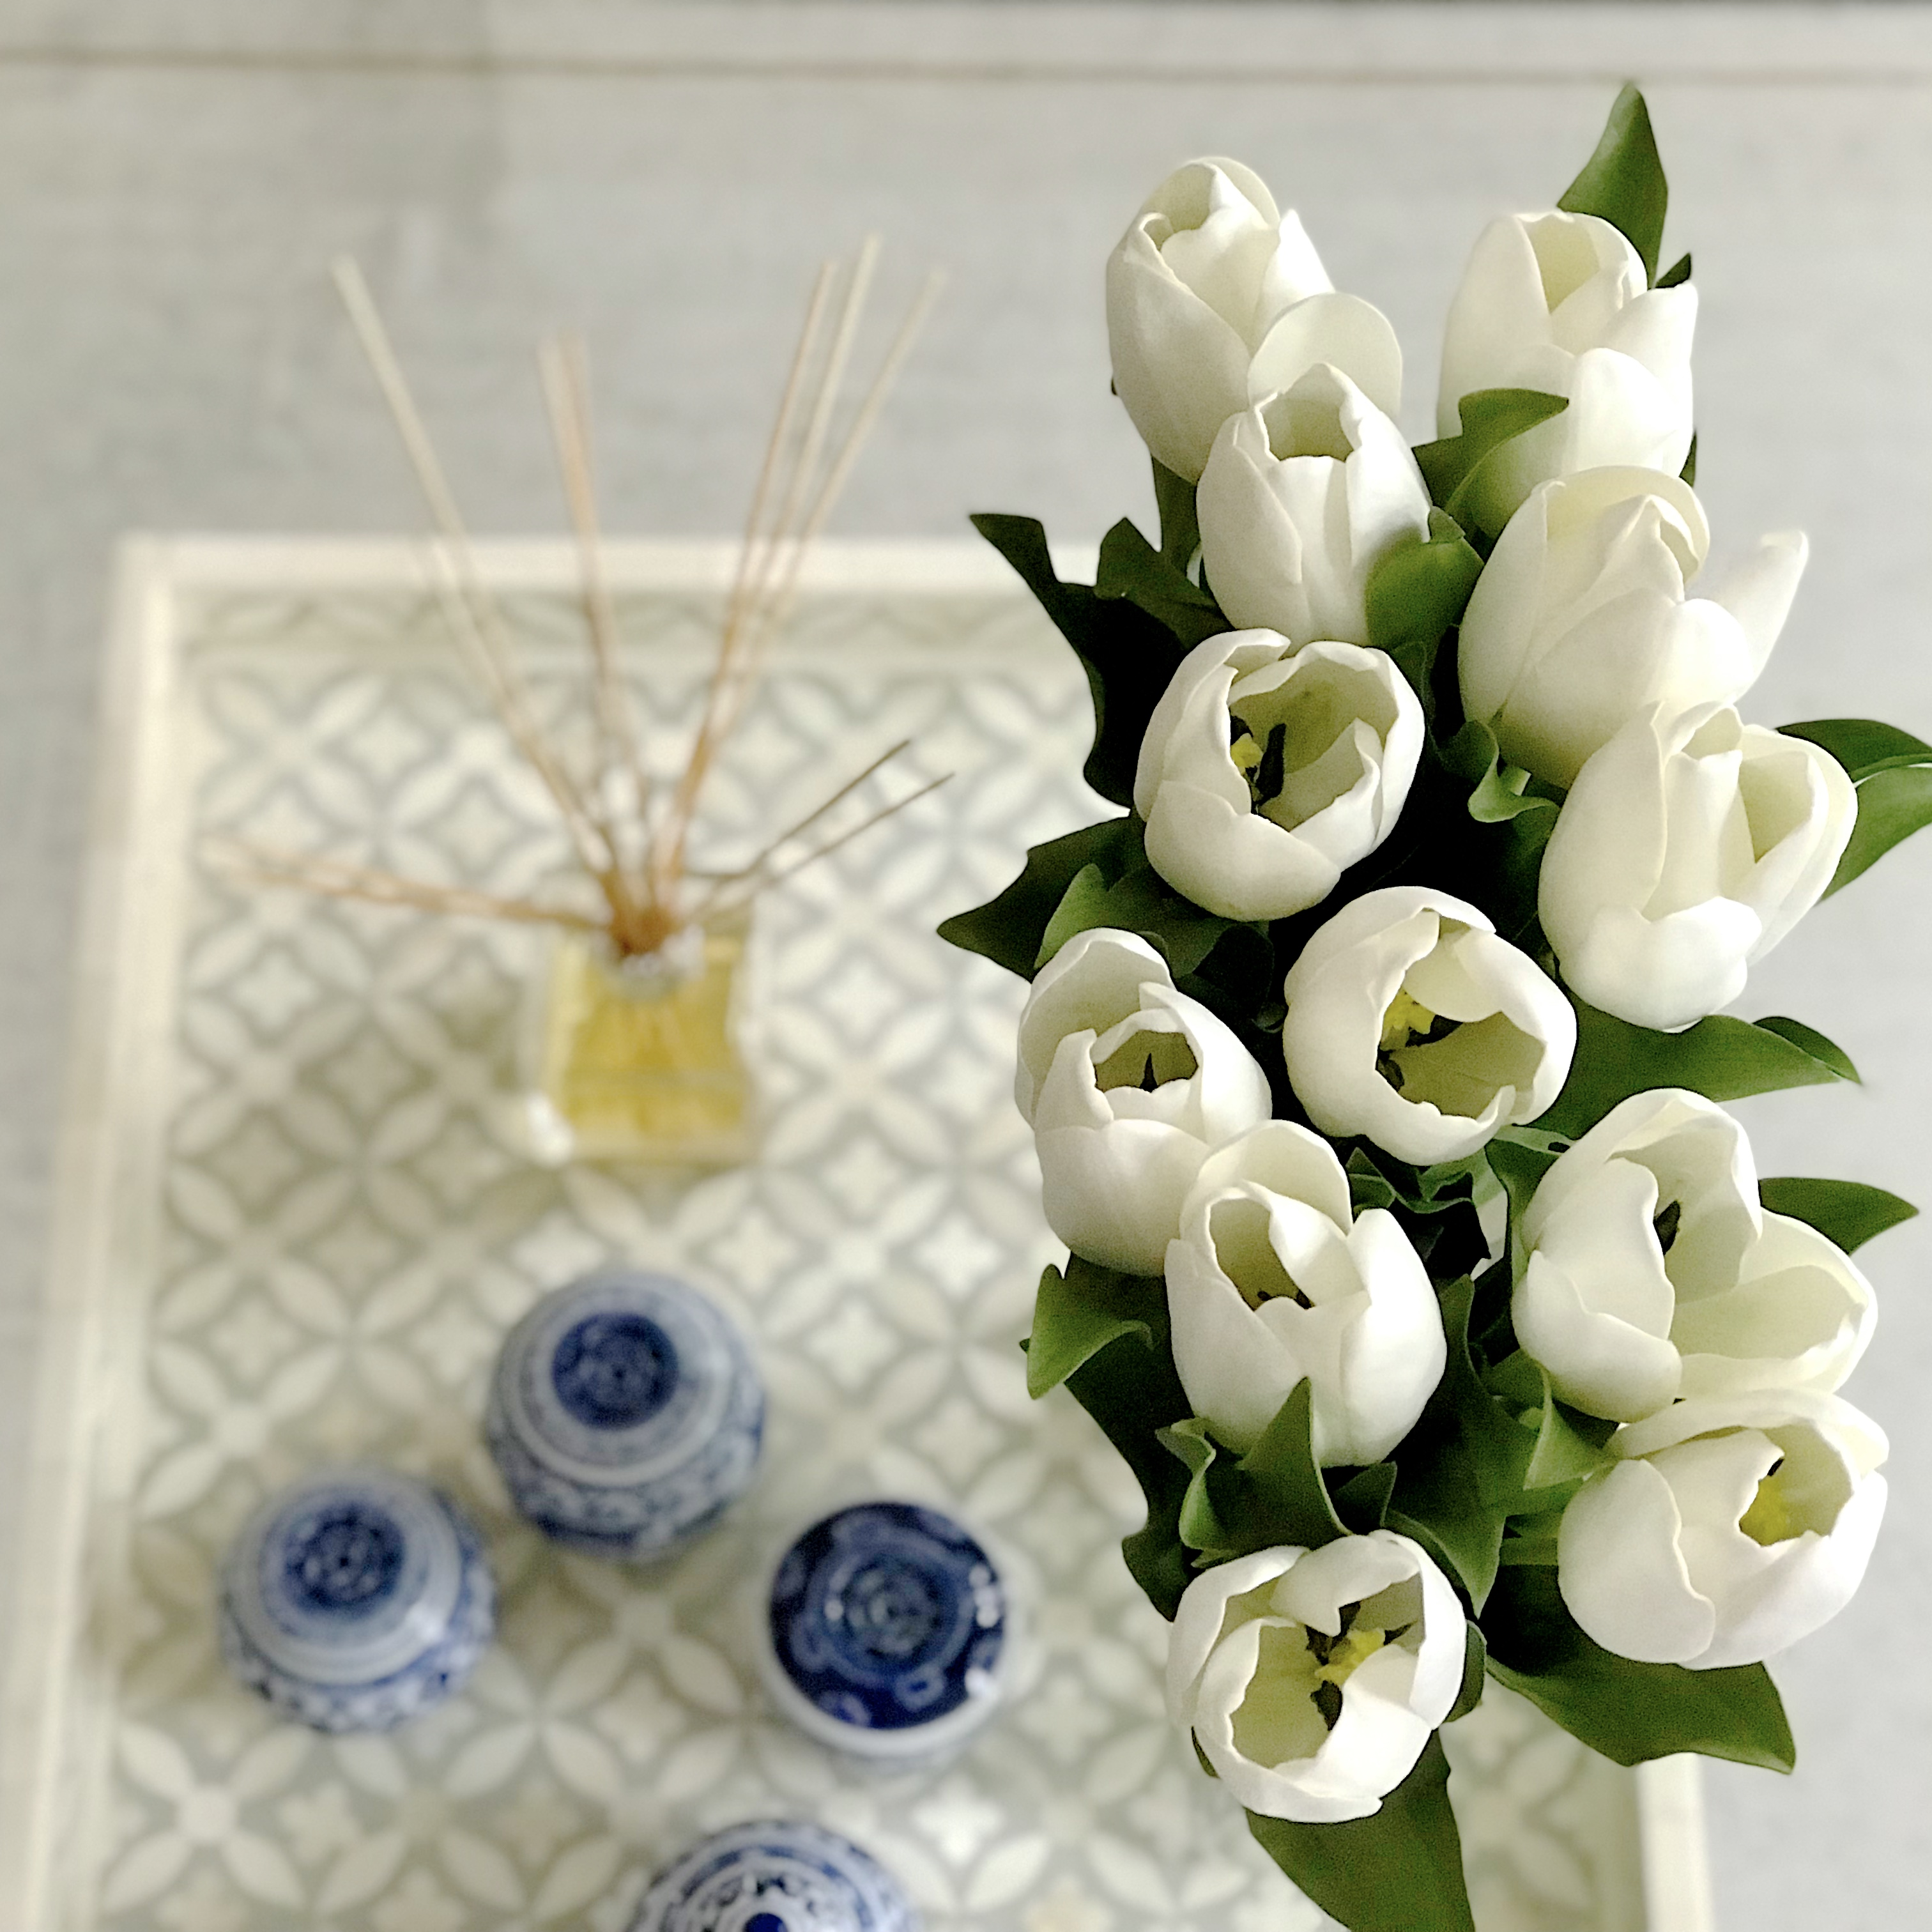 Artificial silk flowers edmonton foreverfloraline mightylinksfo